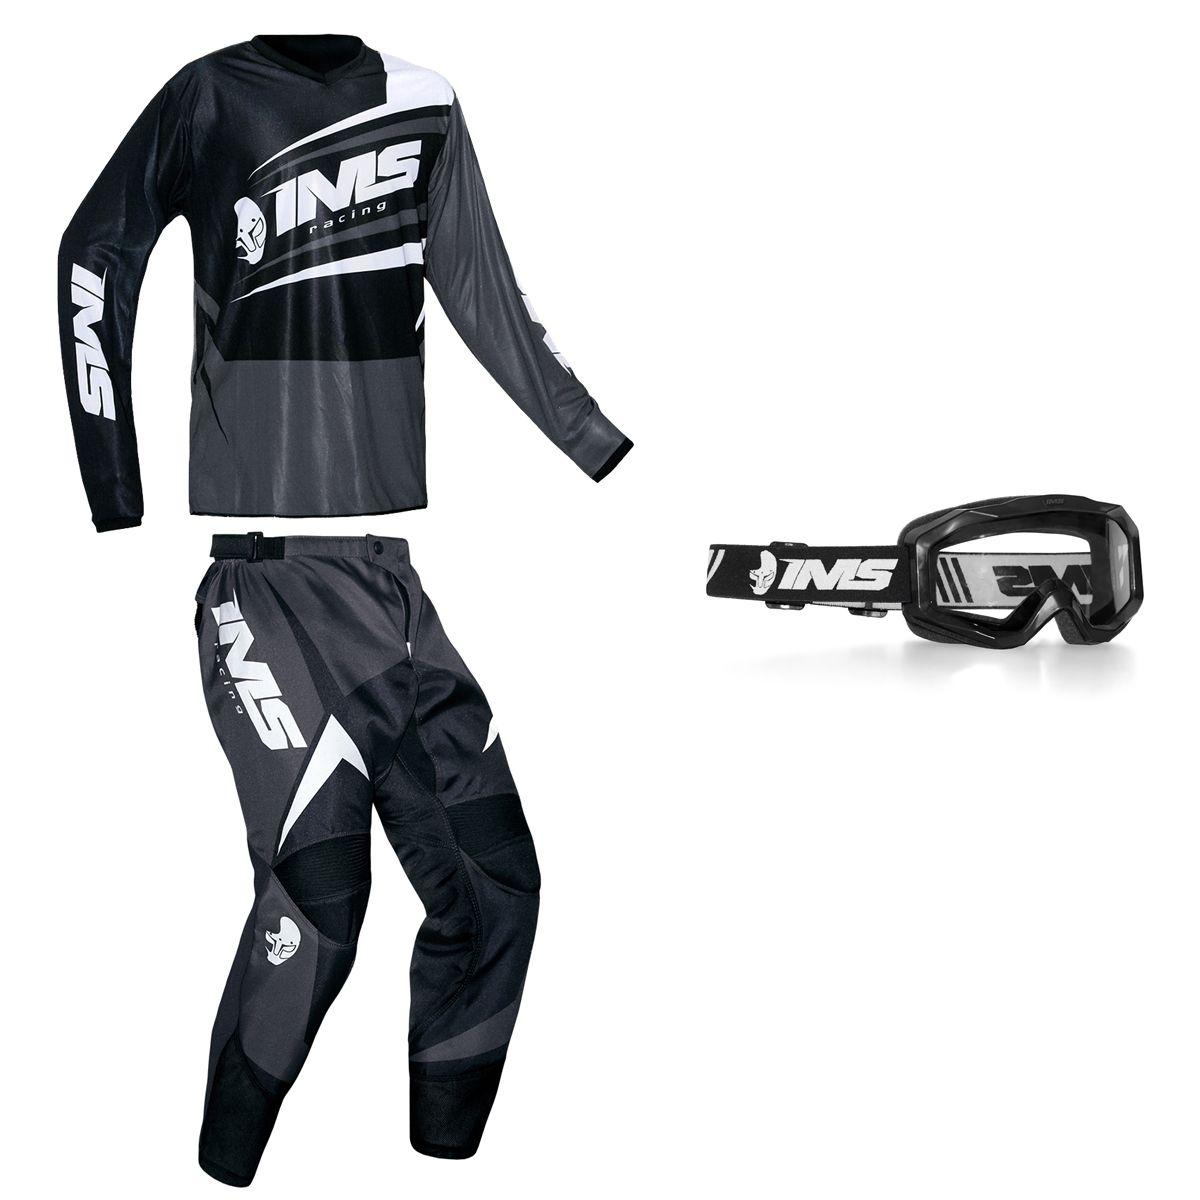 Kit Conjunto Roupa Ims Flex Calça Camisa Óculos Trilha Motocross